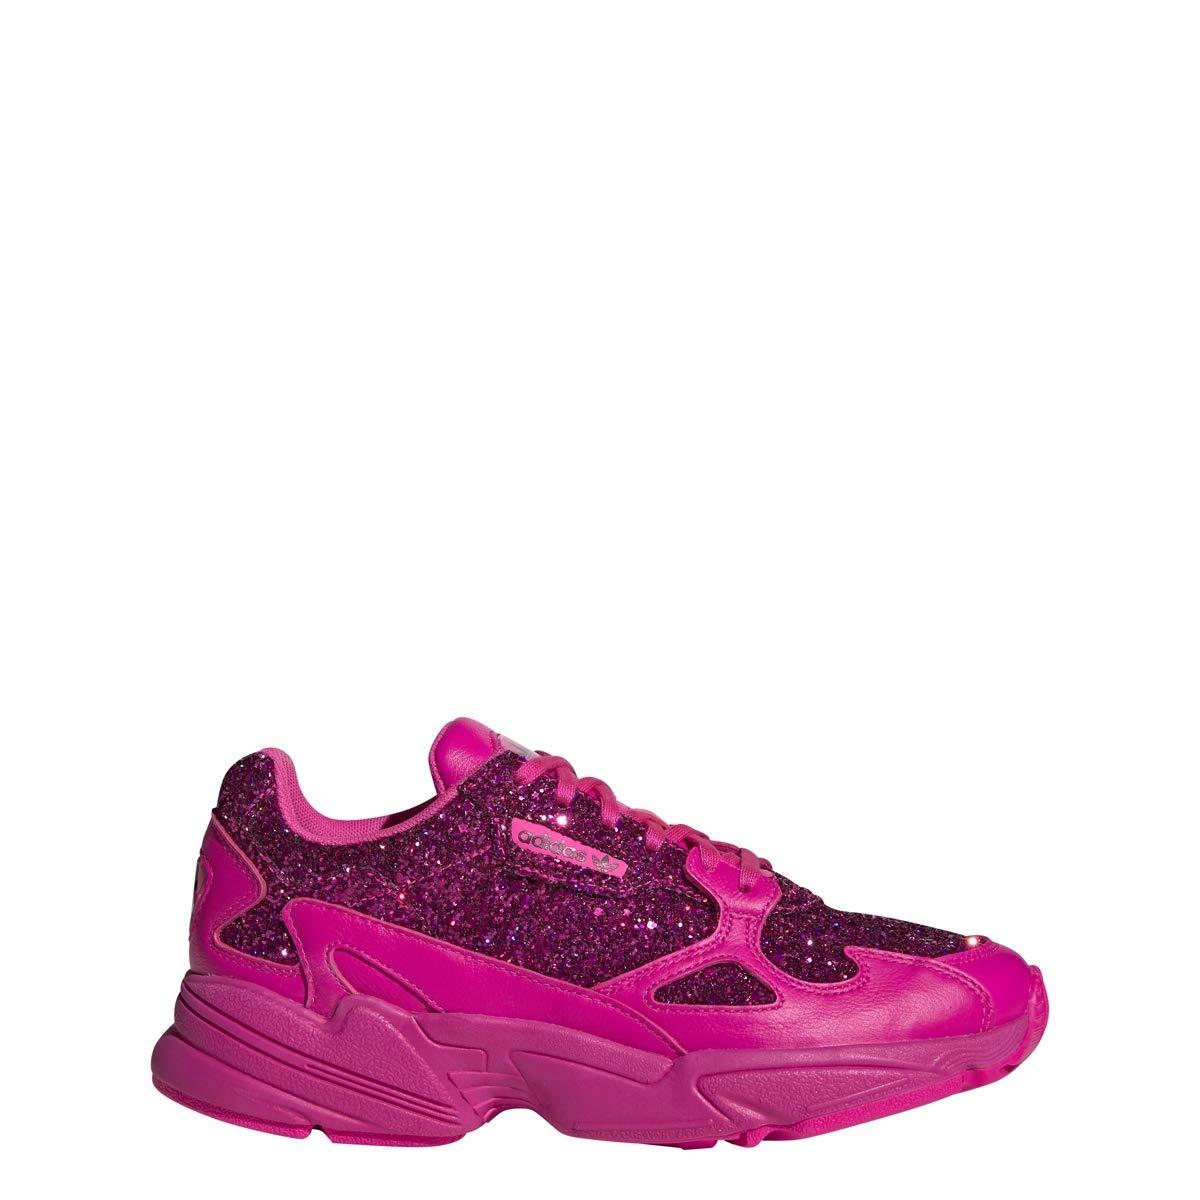 441095327175b adidas Originals Falcon Shoe - Women's Casual